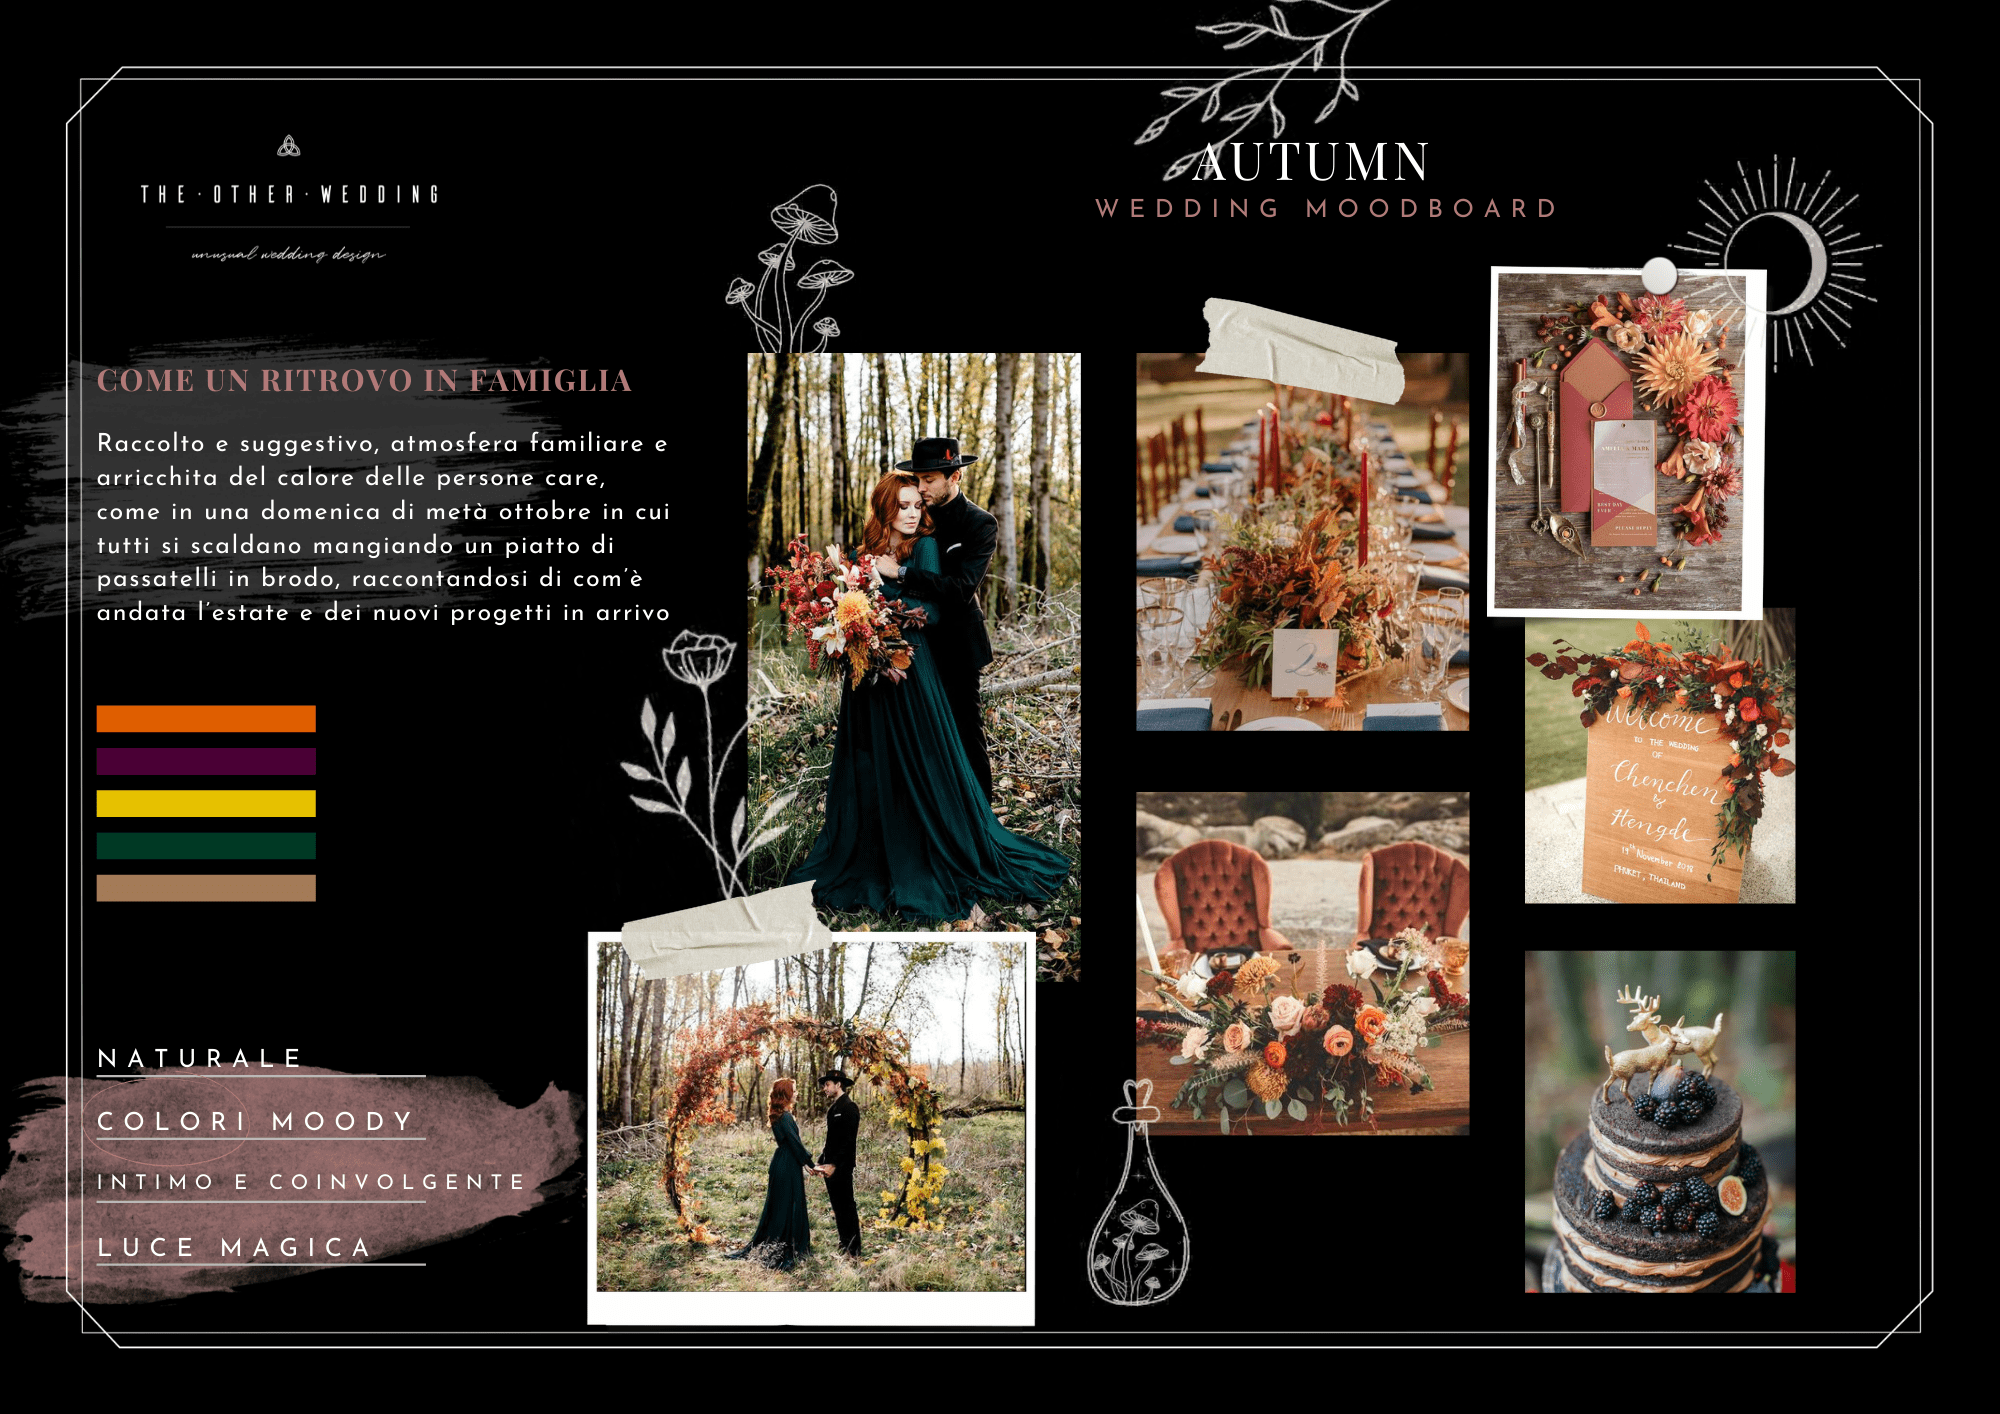 the-other-wedding-unusual-matrimonio-insolito-diverso-originale-particolare-emilia-romagna-italia-wedding-planner-designer-alternativo-sposarsi-autunno